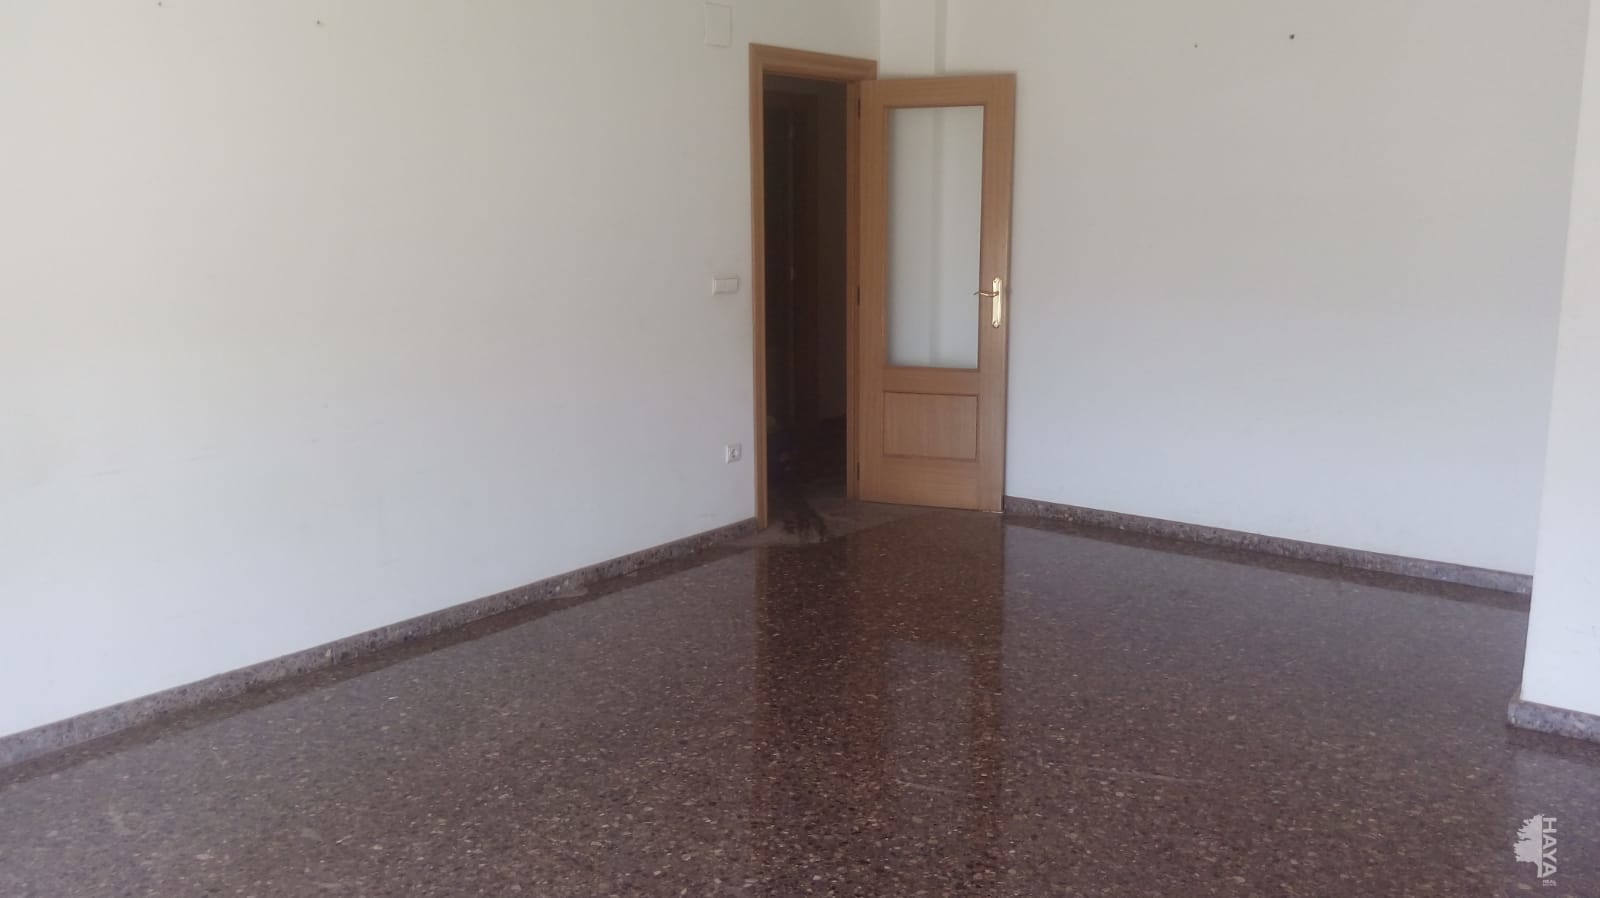 Piso en venta en Onda, Castellón, Calle Vicent Andrés Estellés, 55.501 €, 1 habitación, 1 baño, 75 m2